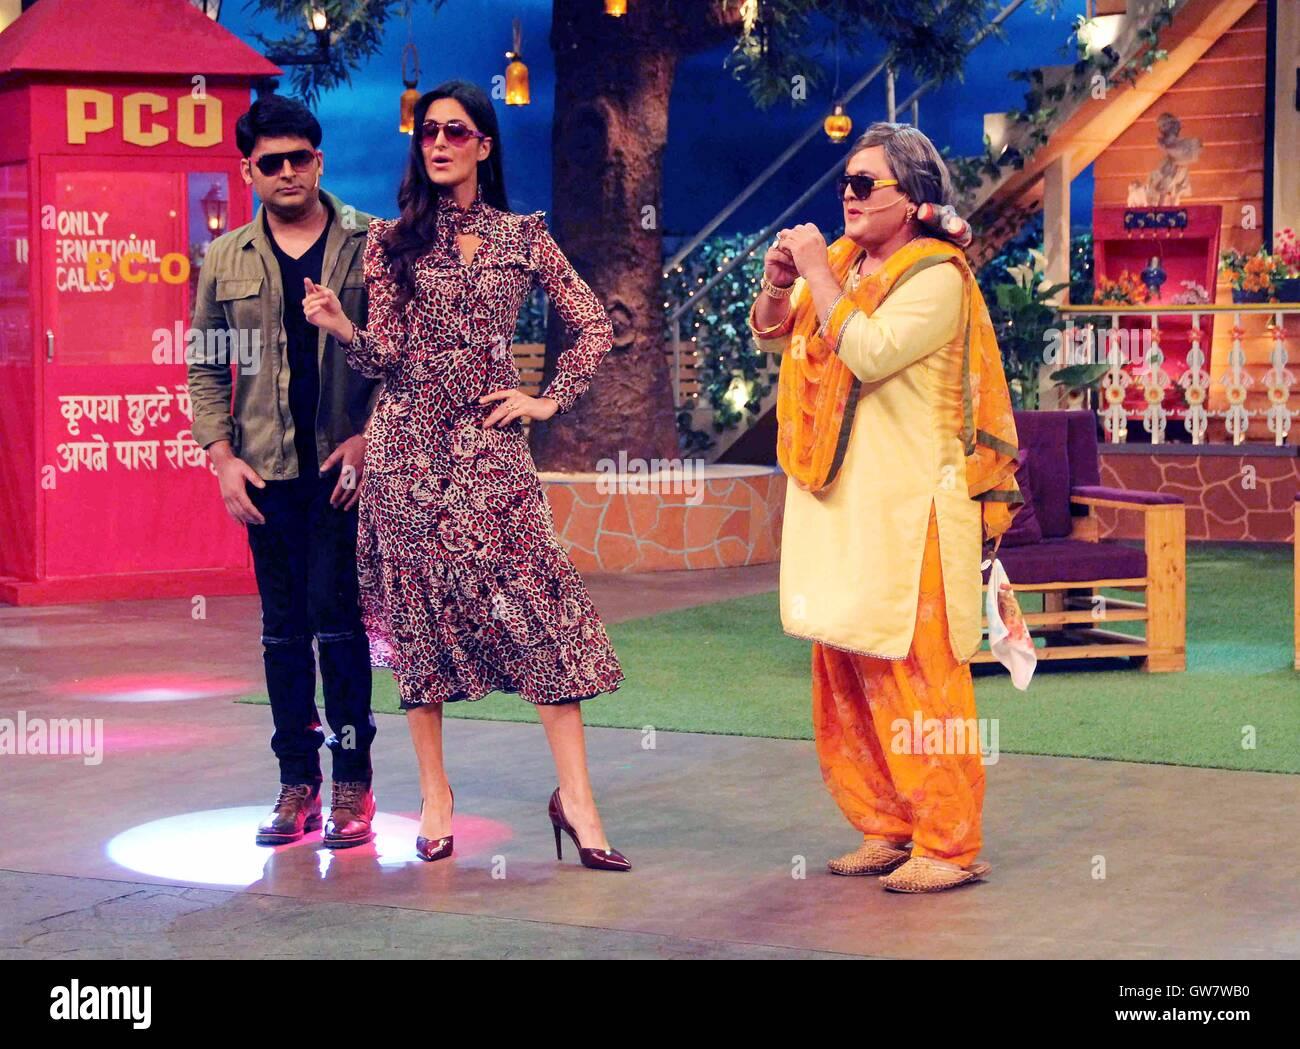 Bollywood actor Katrina Kaif comedians Kapil Sharma Ali Asgar Stock